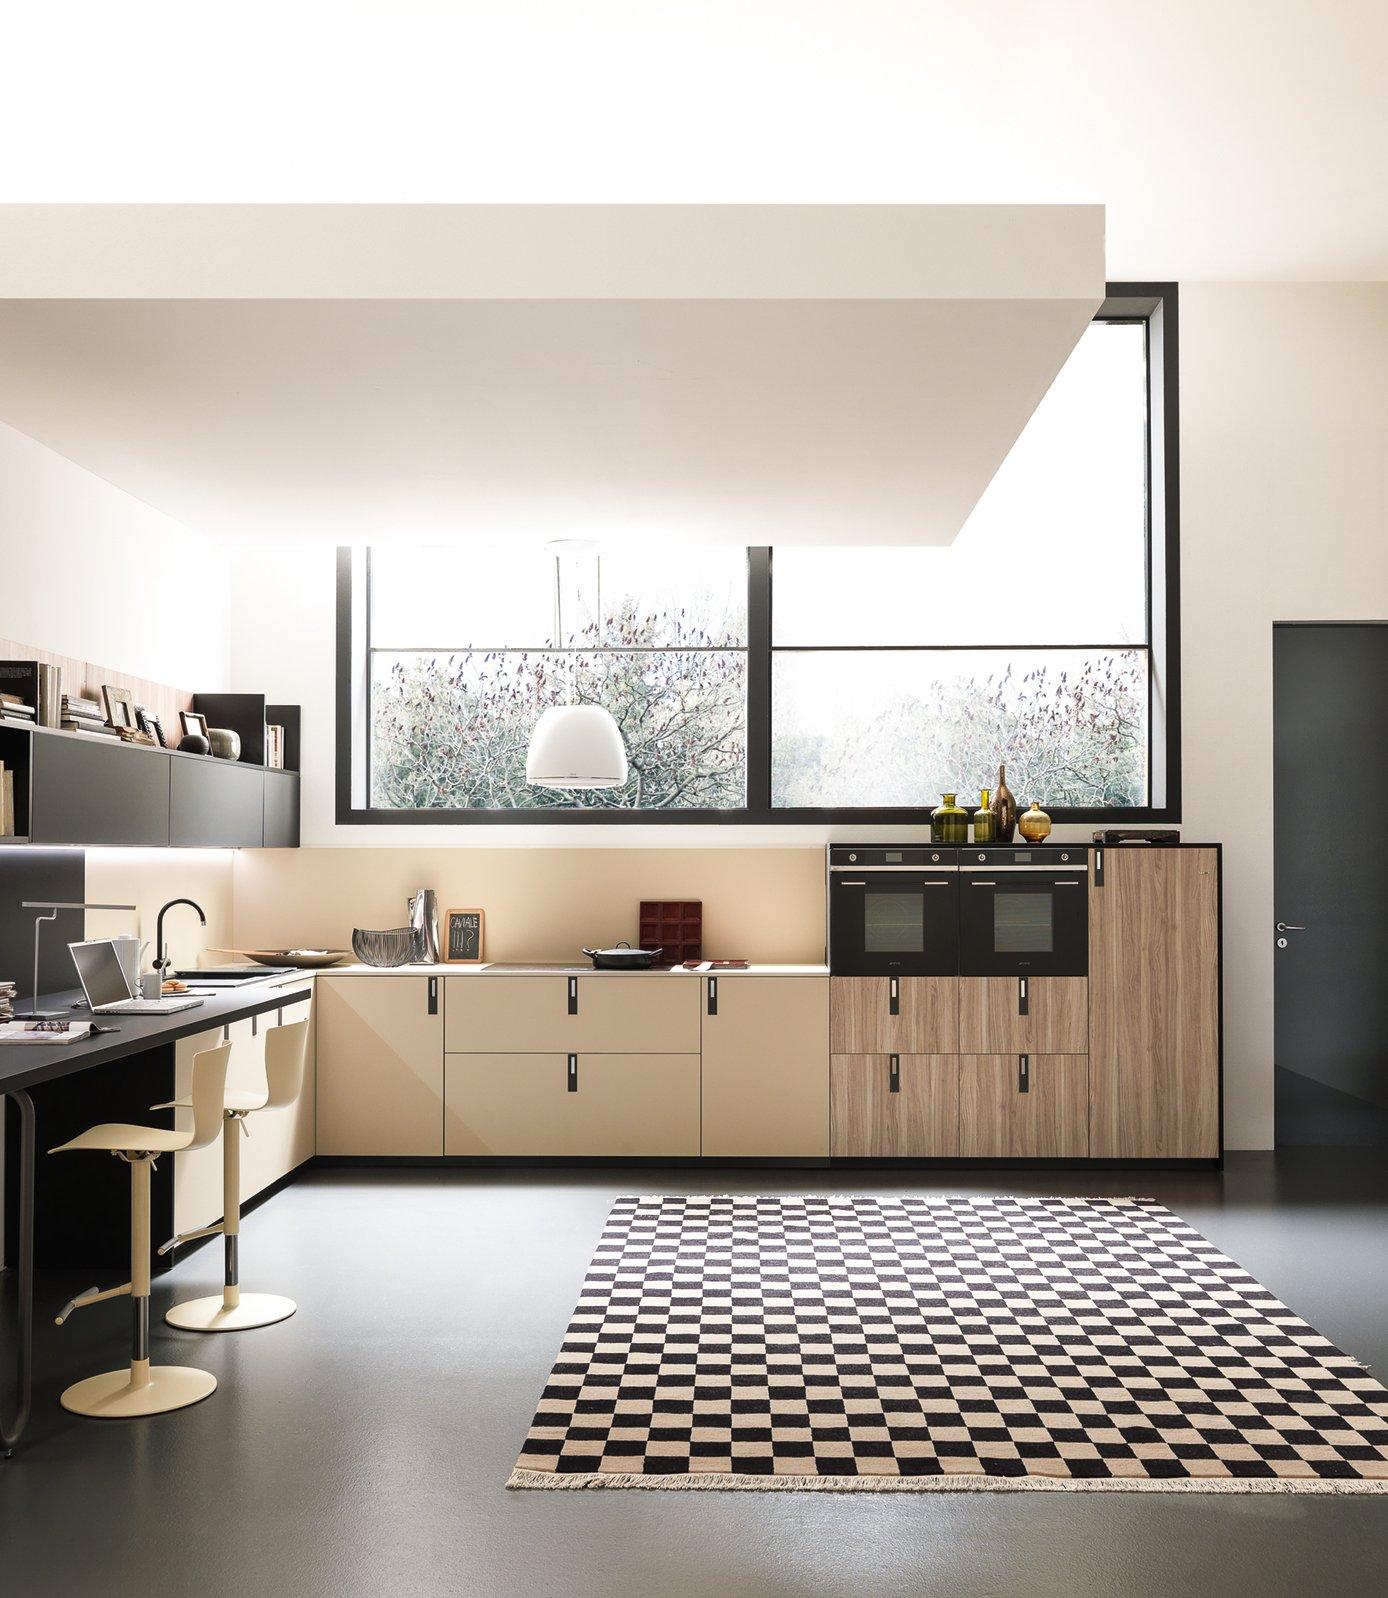 Conosciuto Best Cucina Con Finestra Pictures - Design & Ideas 2017 - candp.us BY53